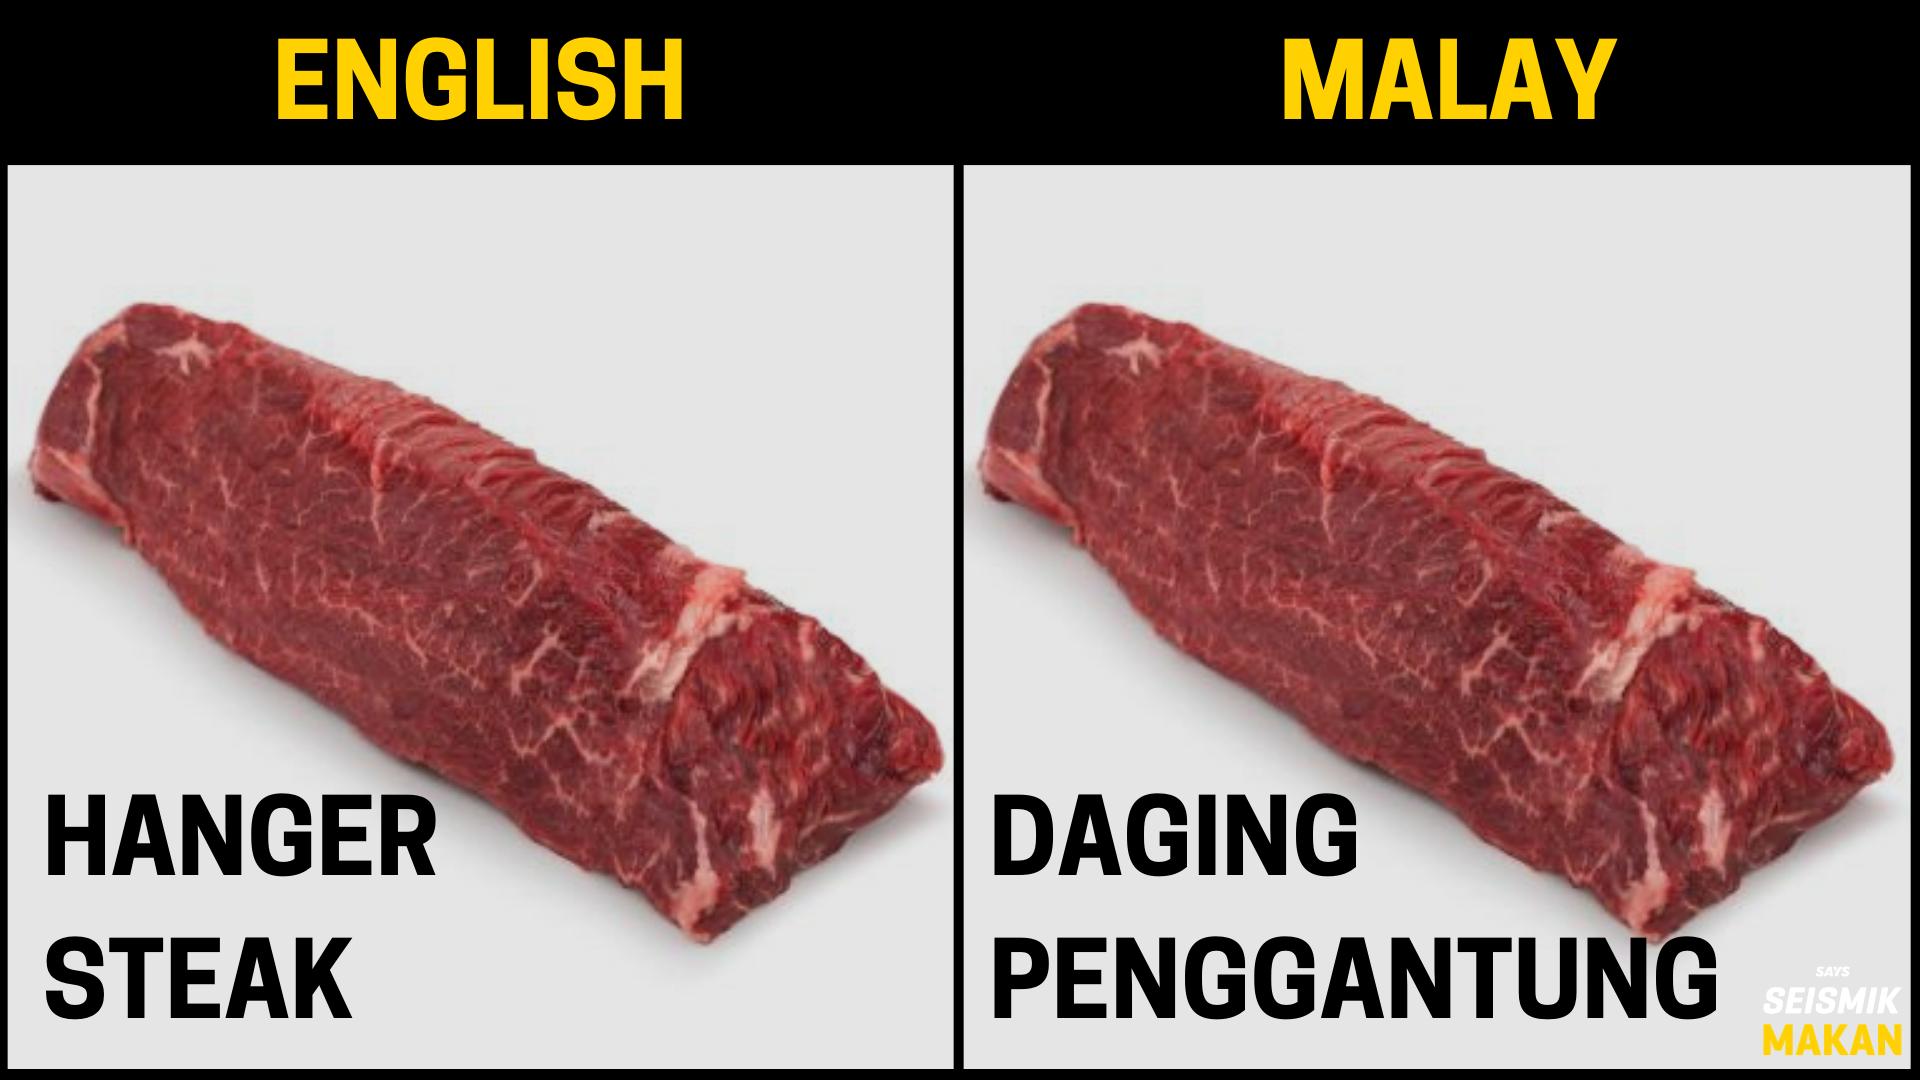 Daging Hanger Bahasa Melayu